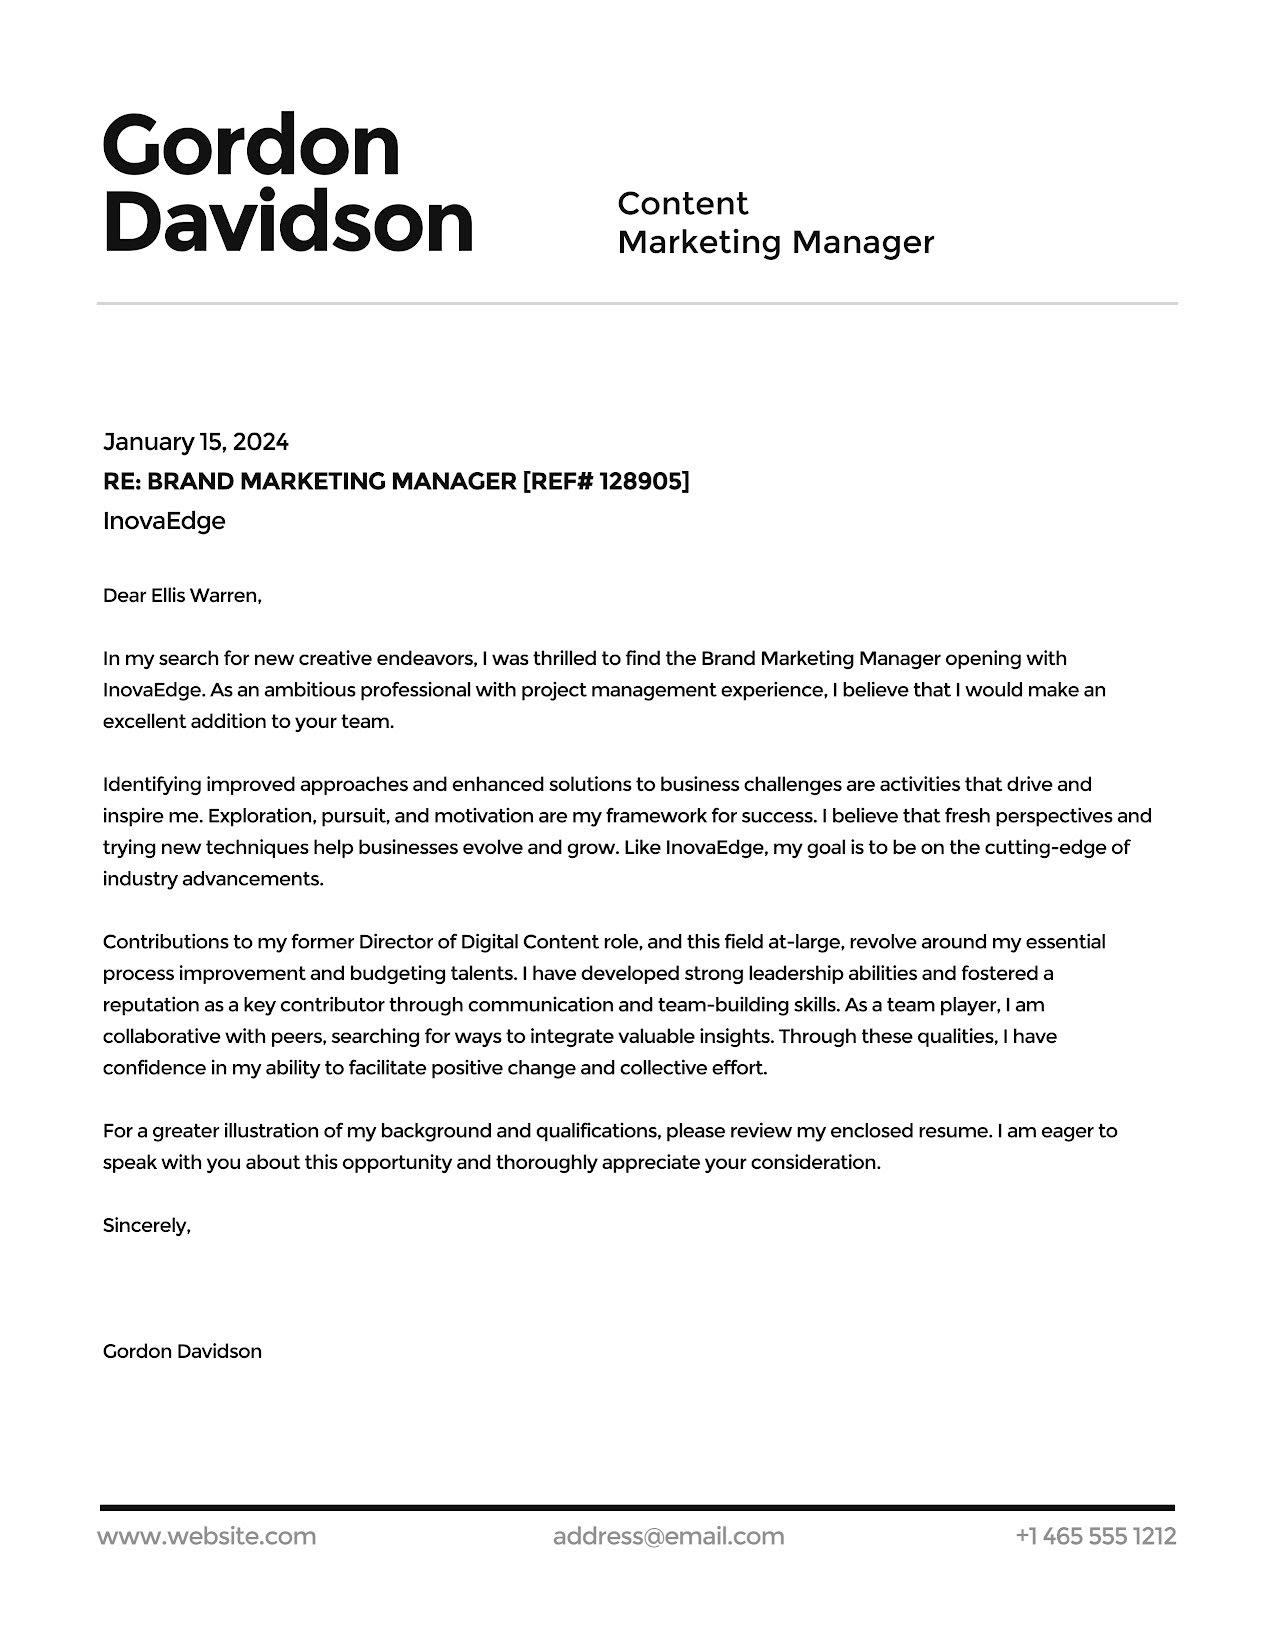 Gordon Davidson - Cover Letter Template